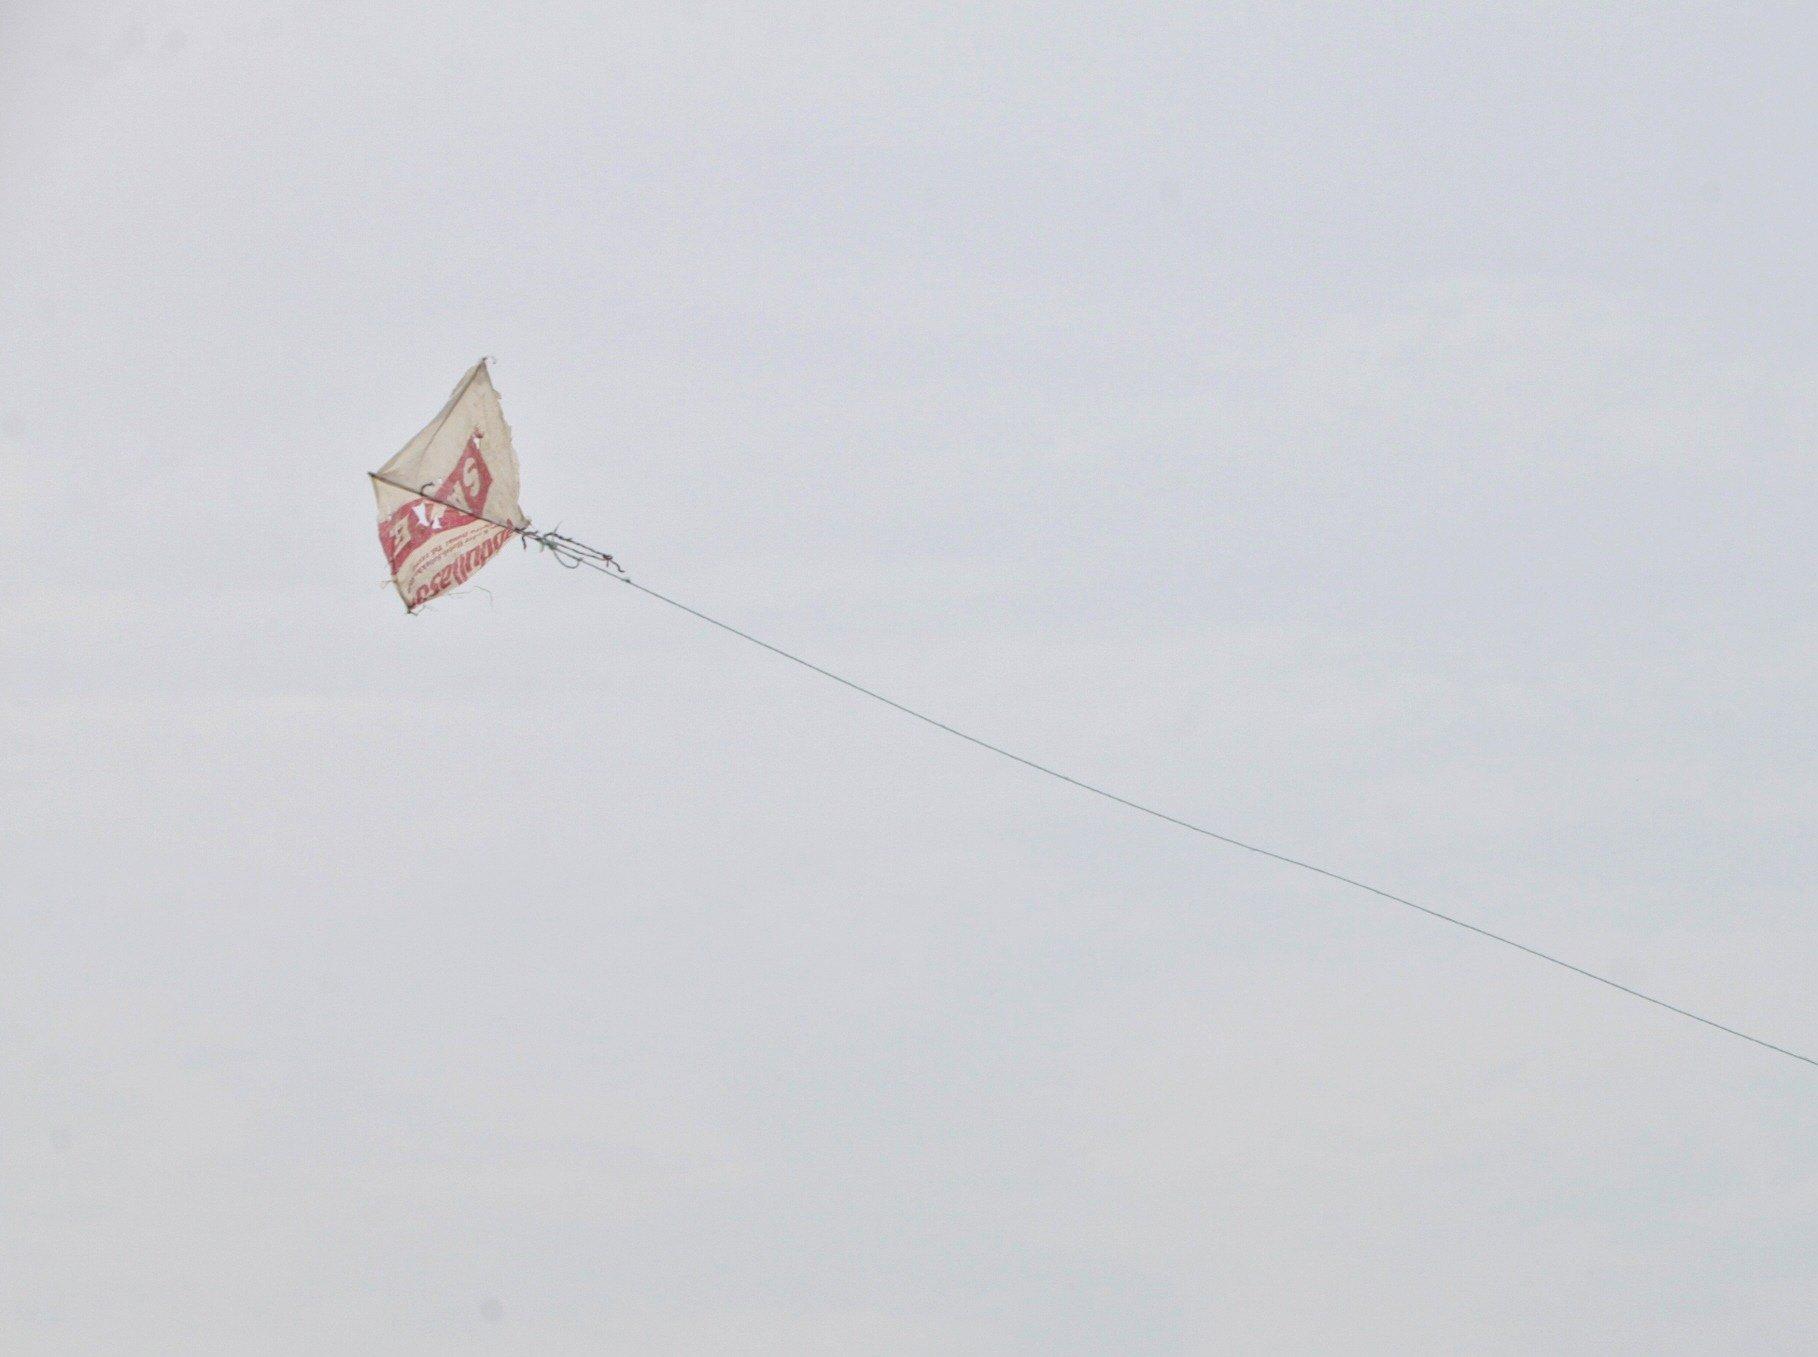 killer kite string takes life of four year old